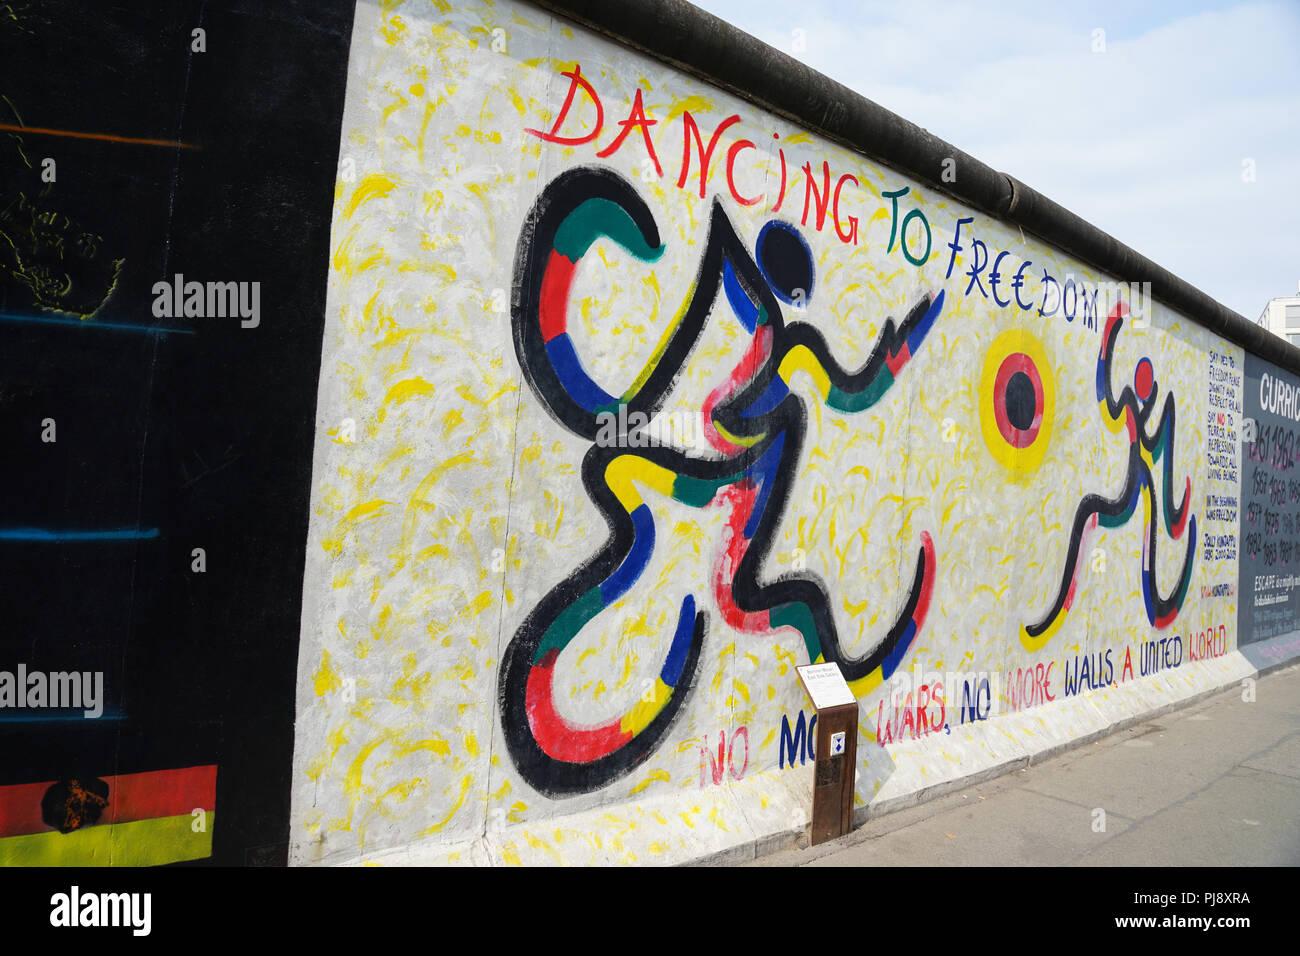 Dancing for Freedom, Art, Eastside Gallery, Berlin, Friedrichshain-Kreuzberg,  heritage-protected landmark, Wall, Berlin, Germany - Stock Image